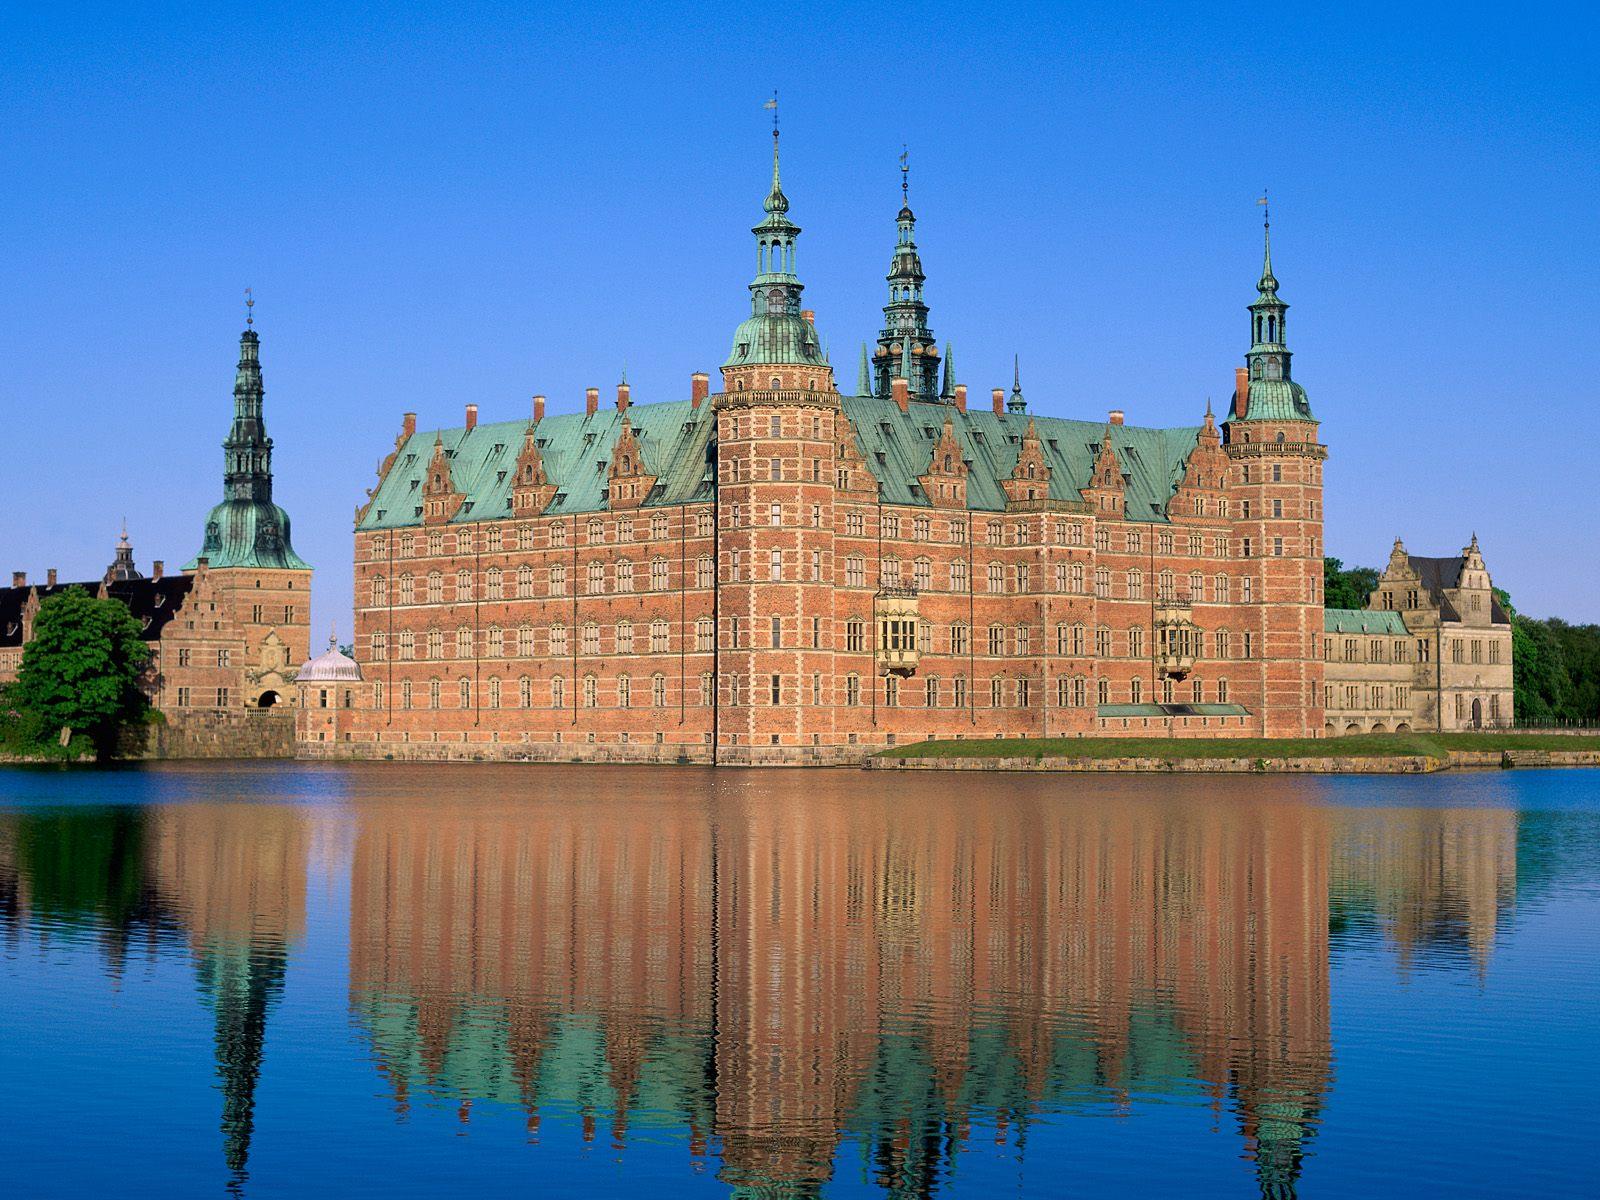 Замок Фредериксборг. Источник http://pelikan-kaliningrad.ru/